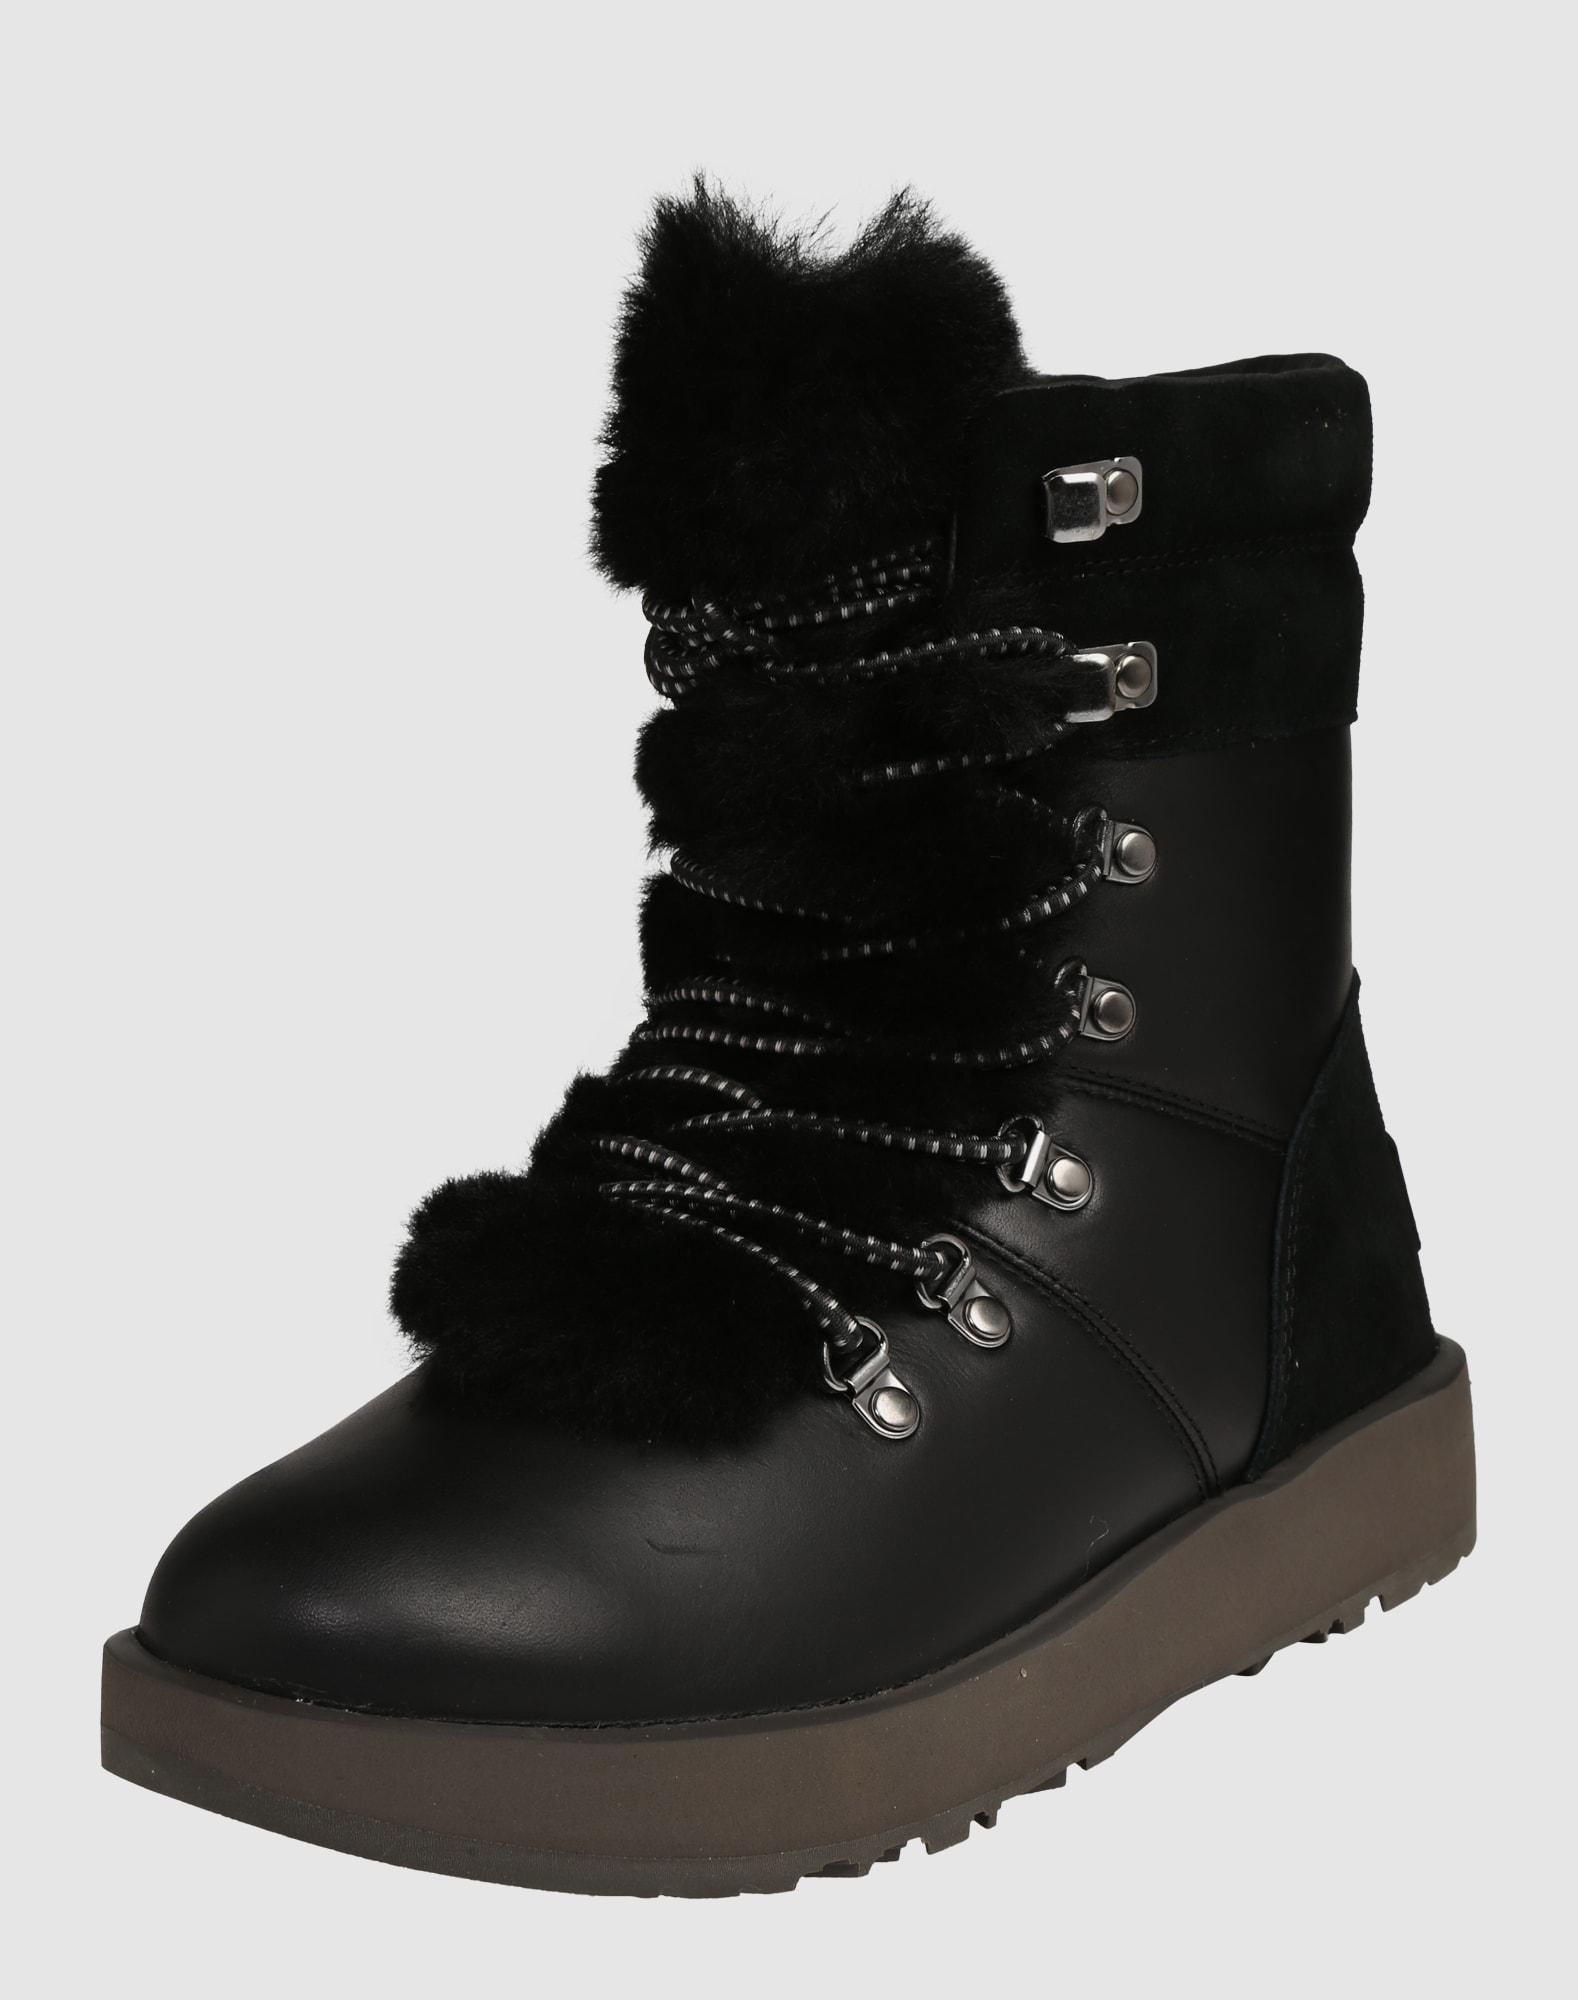 ugg boot 39 viki waterproof 39 in schwarz about you. Black Bedroom Furniture Sets. Home Design Ideas